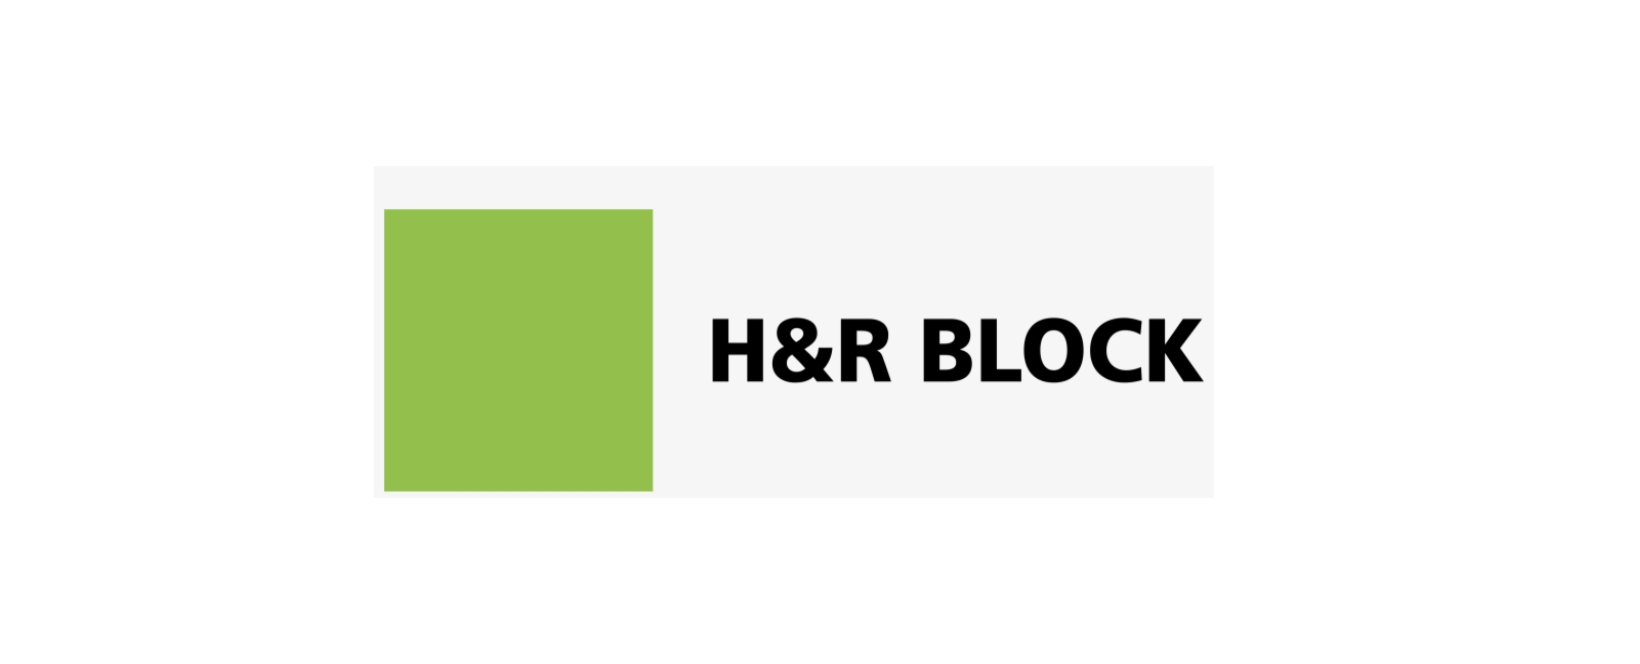 H&R BLOCK Discount Code 2021